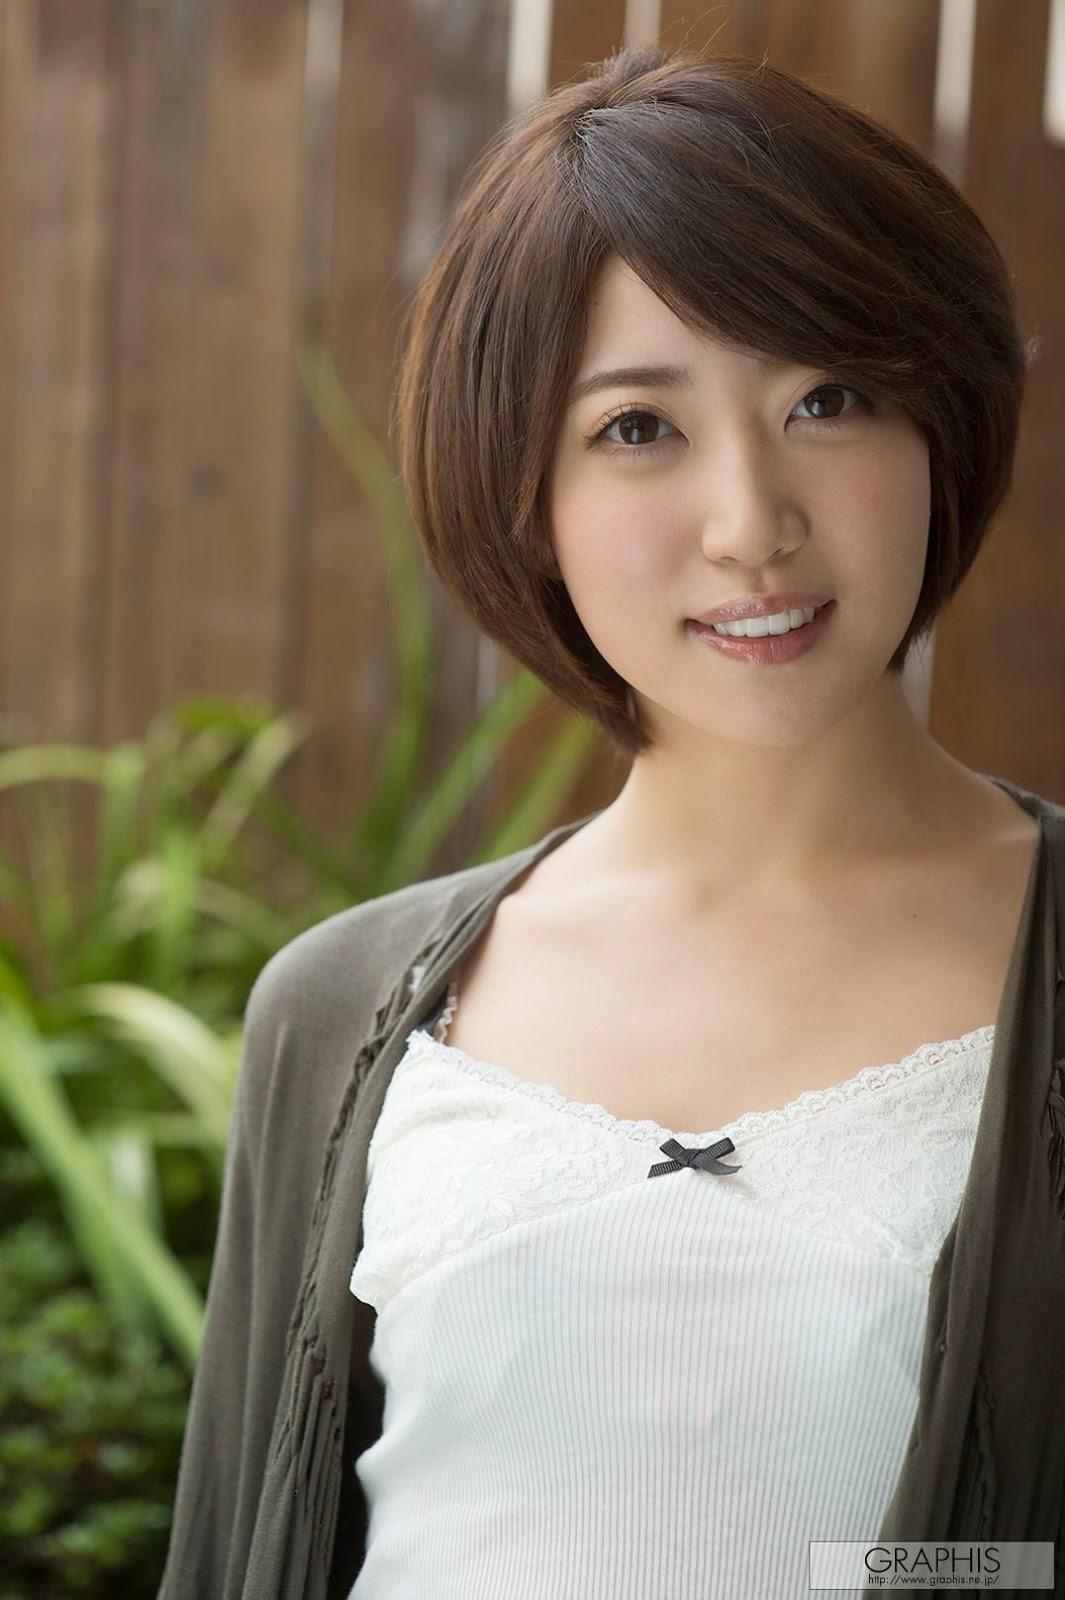 PhimVu Blog: Lenfried Japan Hot